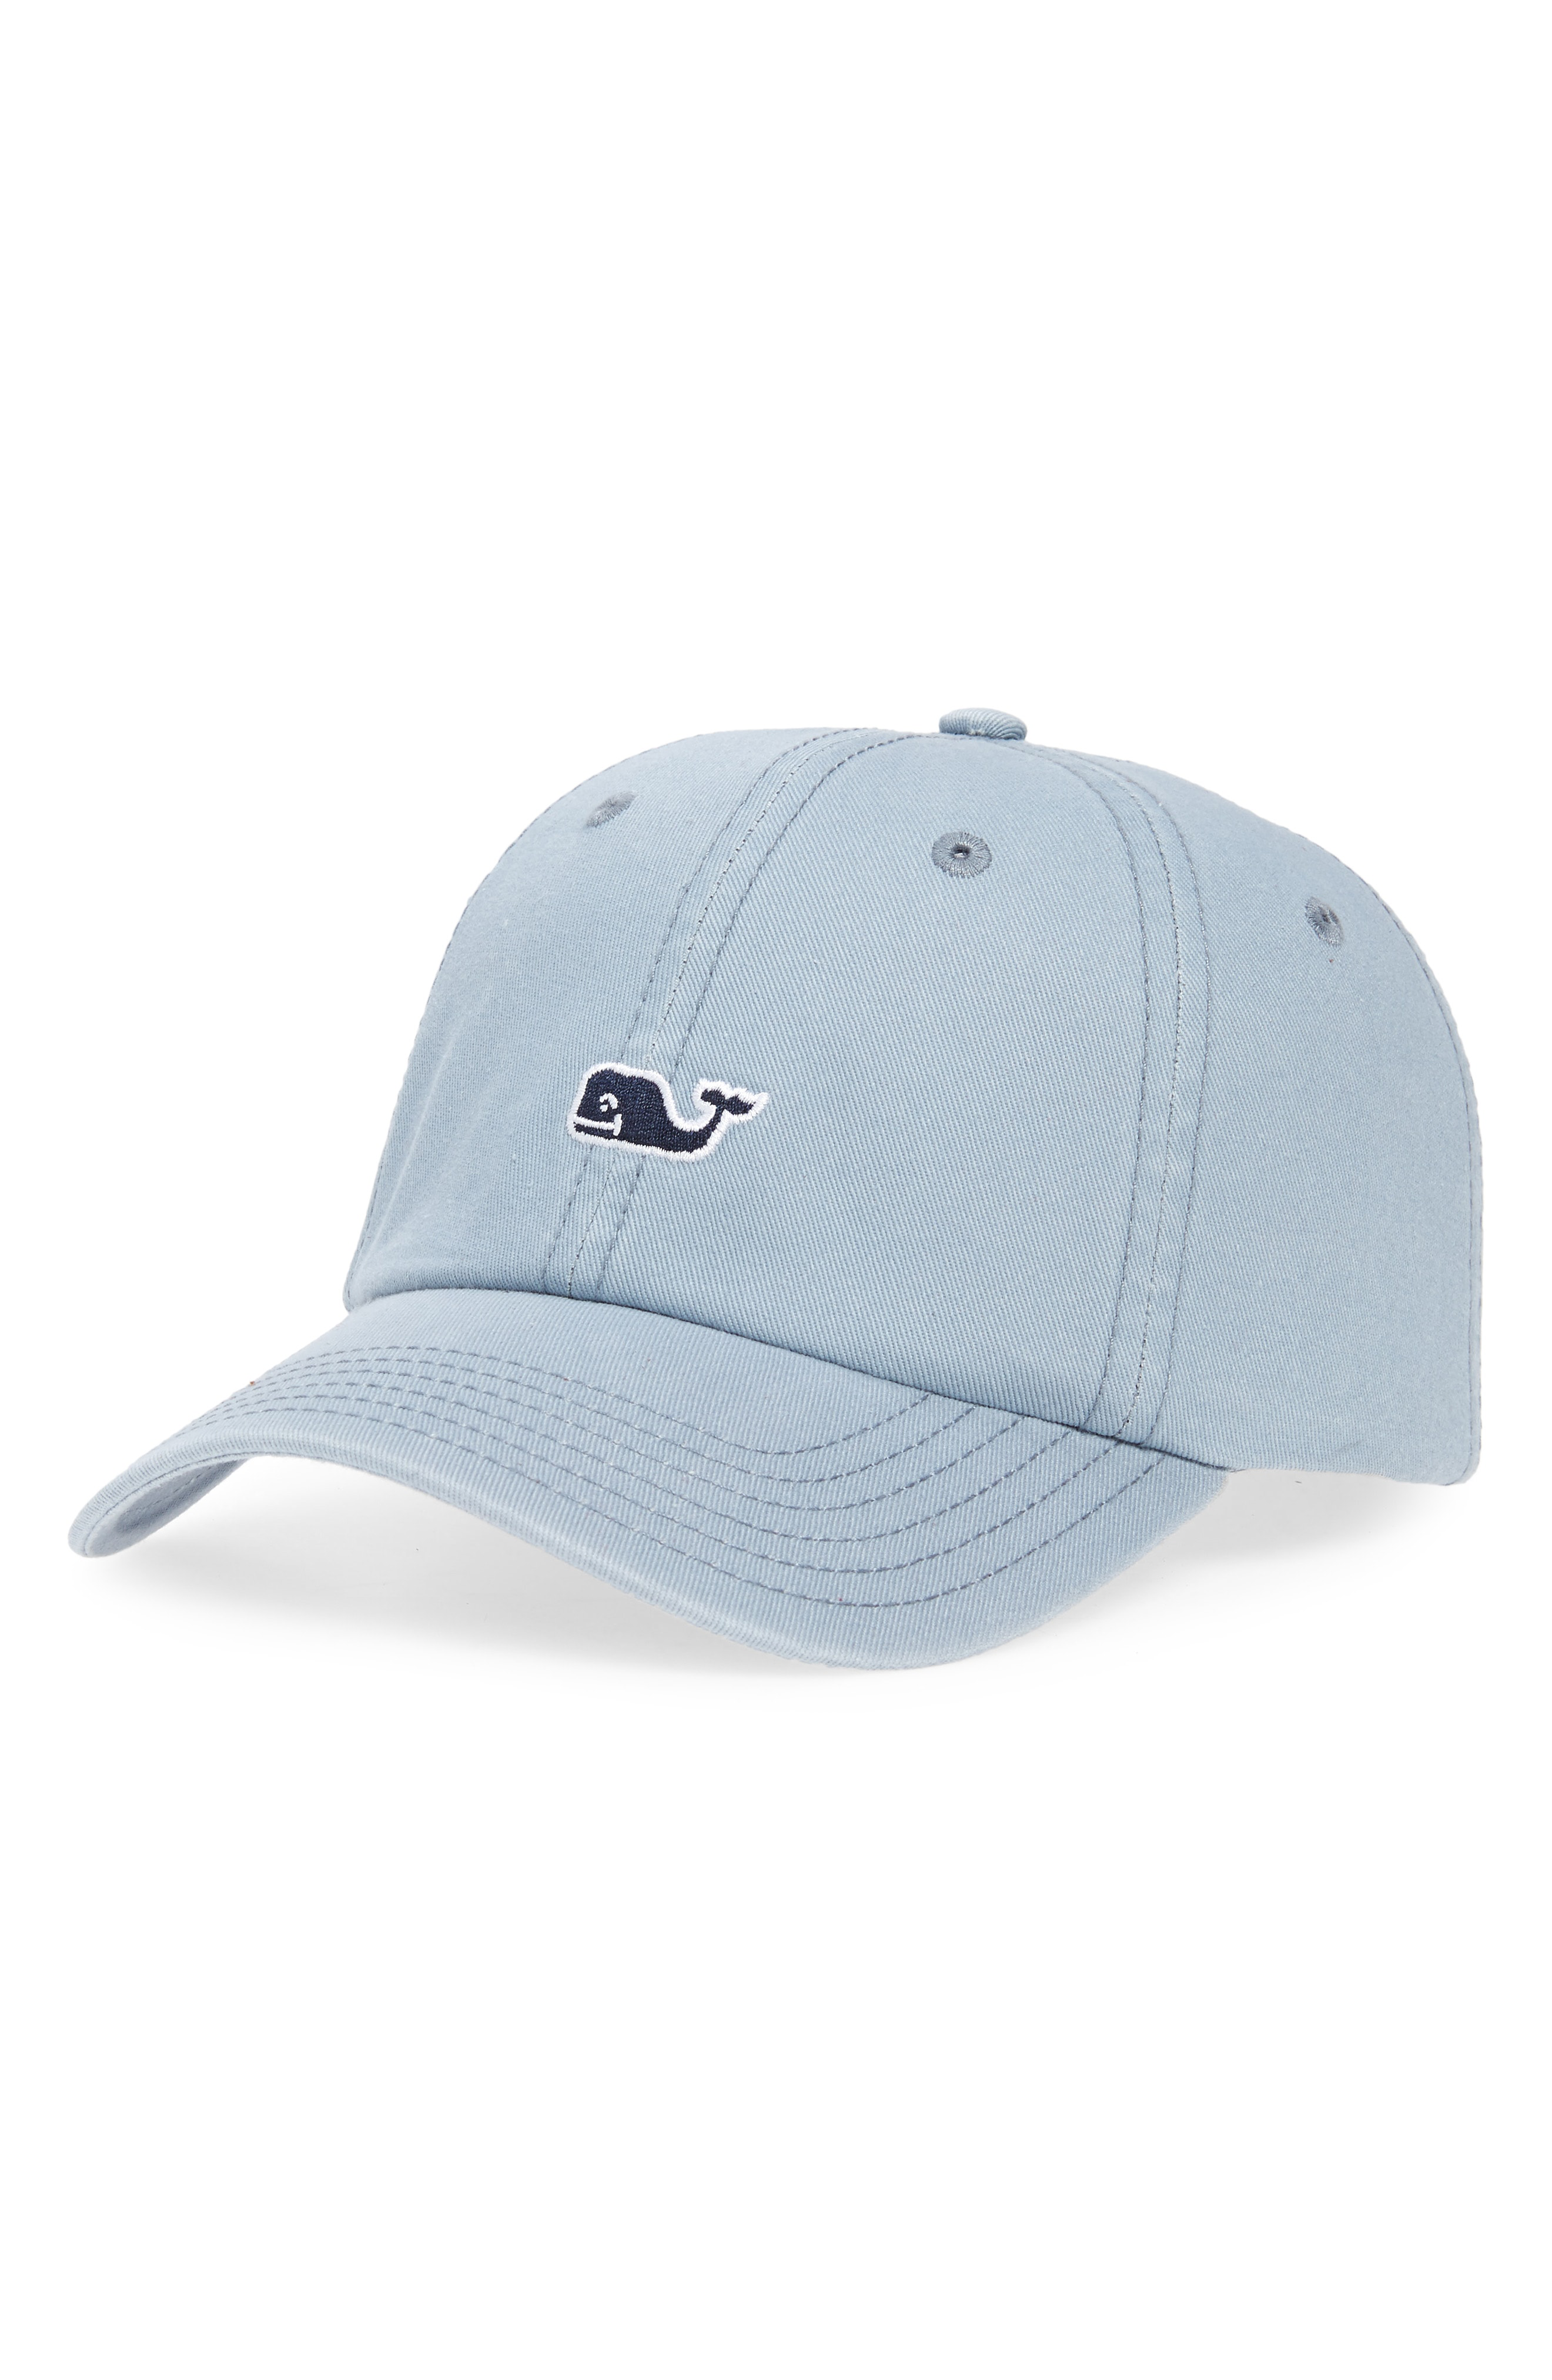 dc1a3d8ffeb Vineyard Vines Whale Logo Baseball Cap - Grey In Barracuda